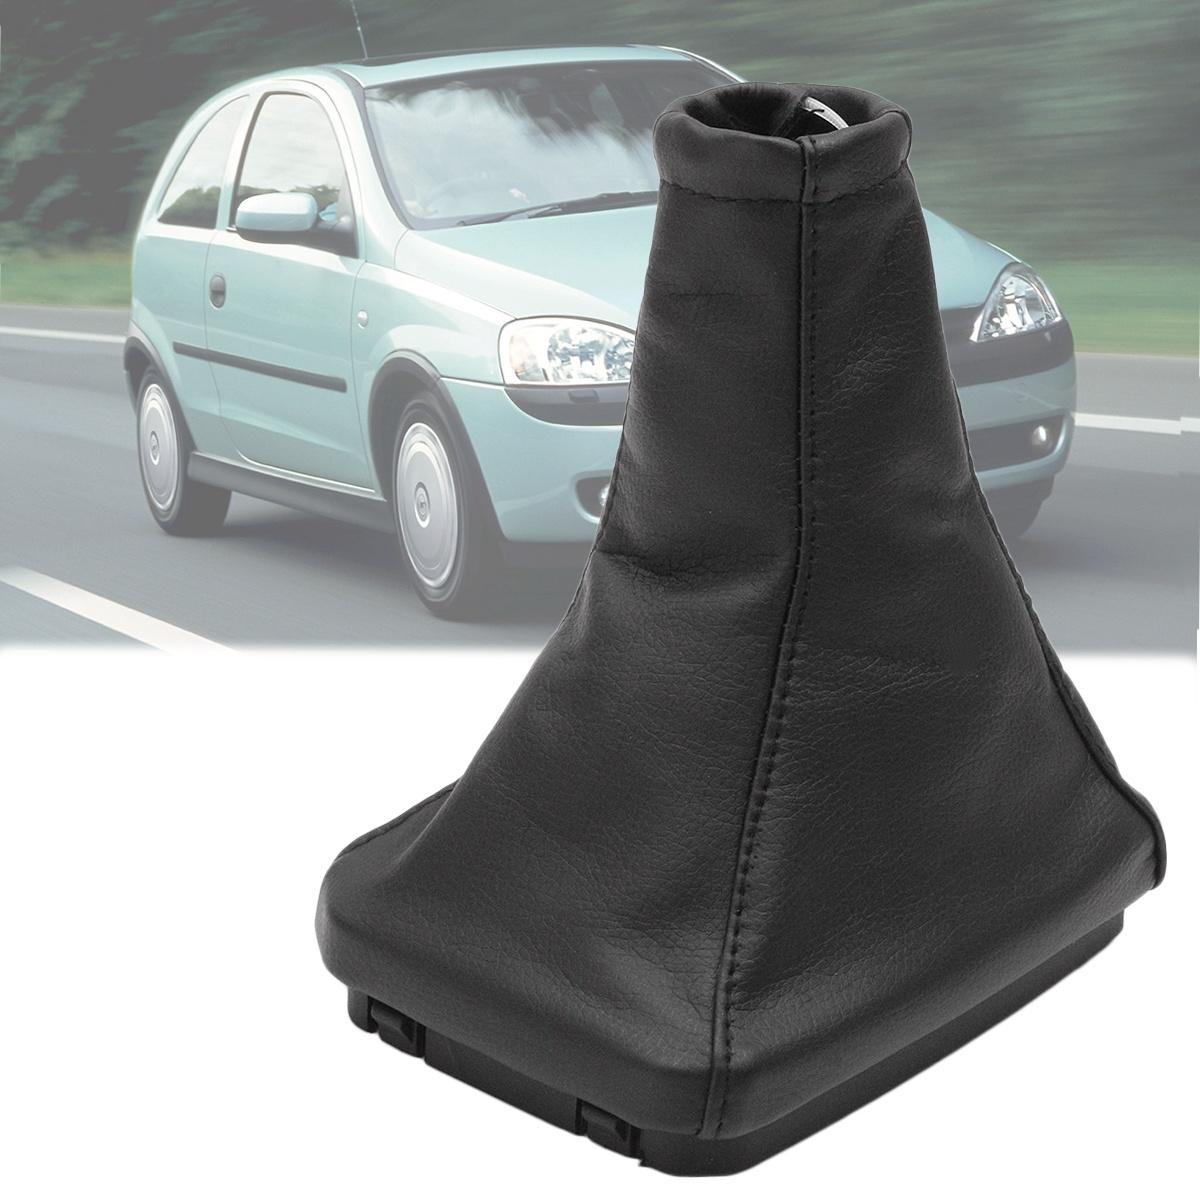 GEARSTICK Gaiter Boot Opel//Vauxhall Meriva A Corsa C tigrab Combo 9200970 738423